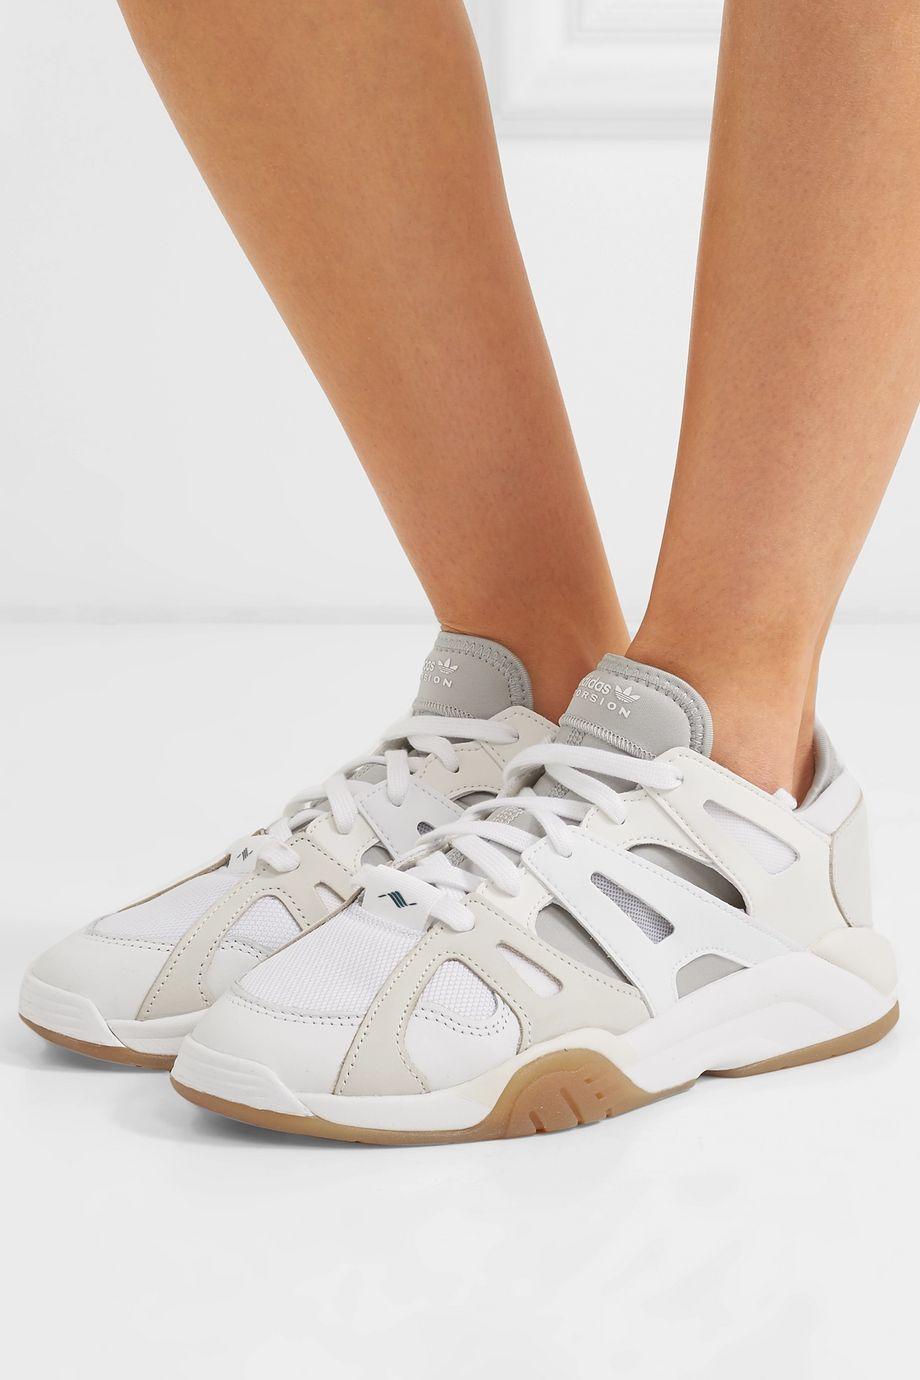 adidas Originals Dimension Low Sneakers aus Leder, Neopren und Mesh